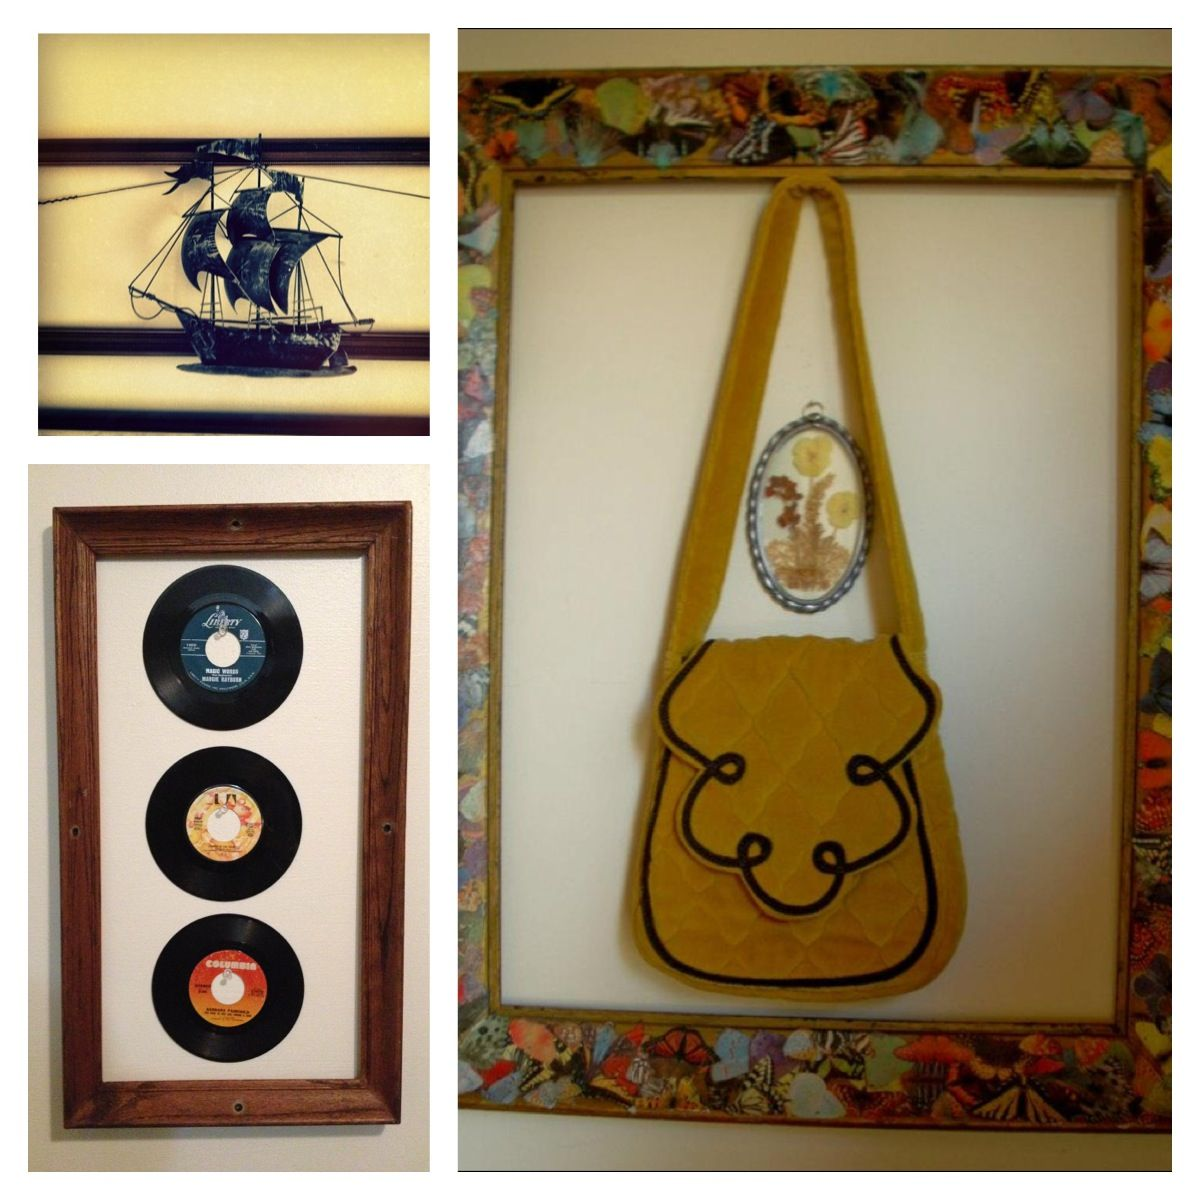 Put your favorite knick knacks in empty frames | Repurpose ...